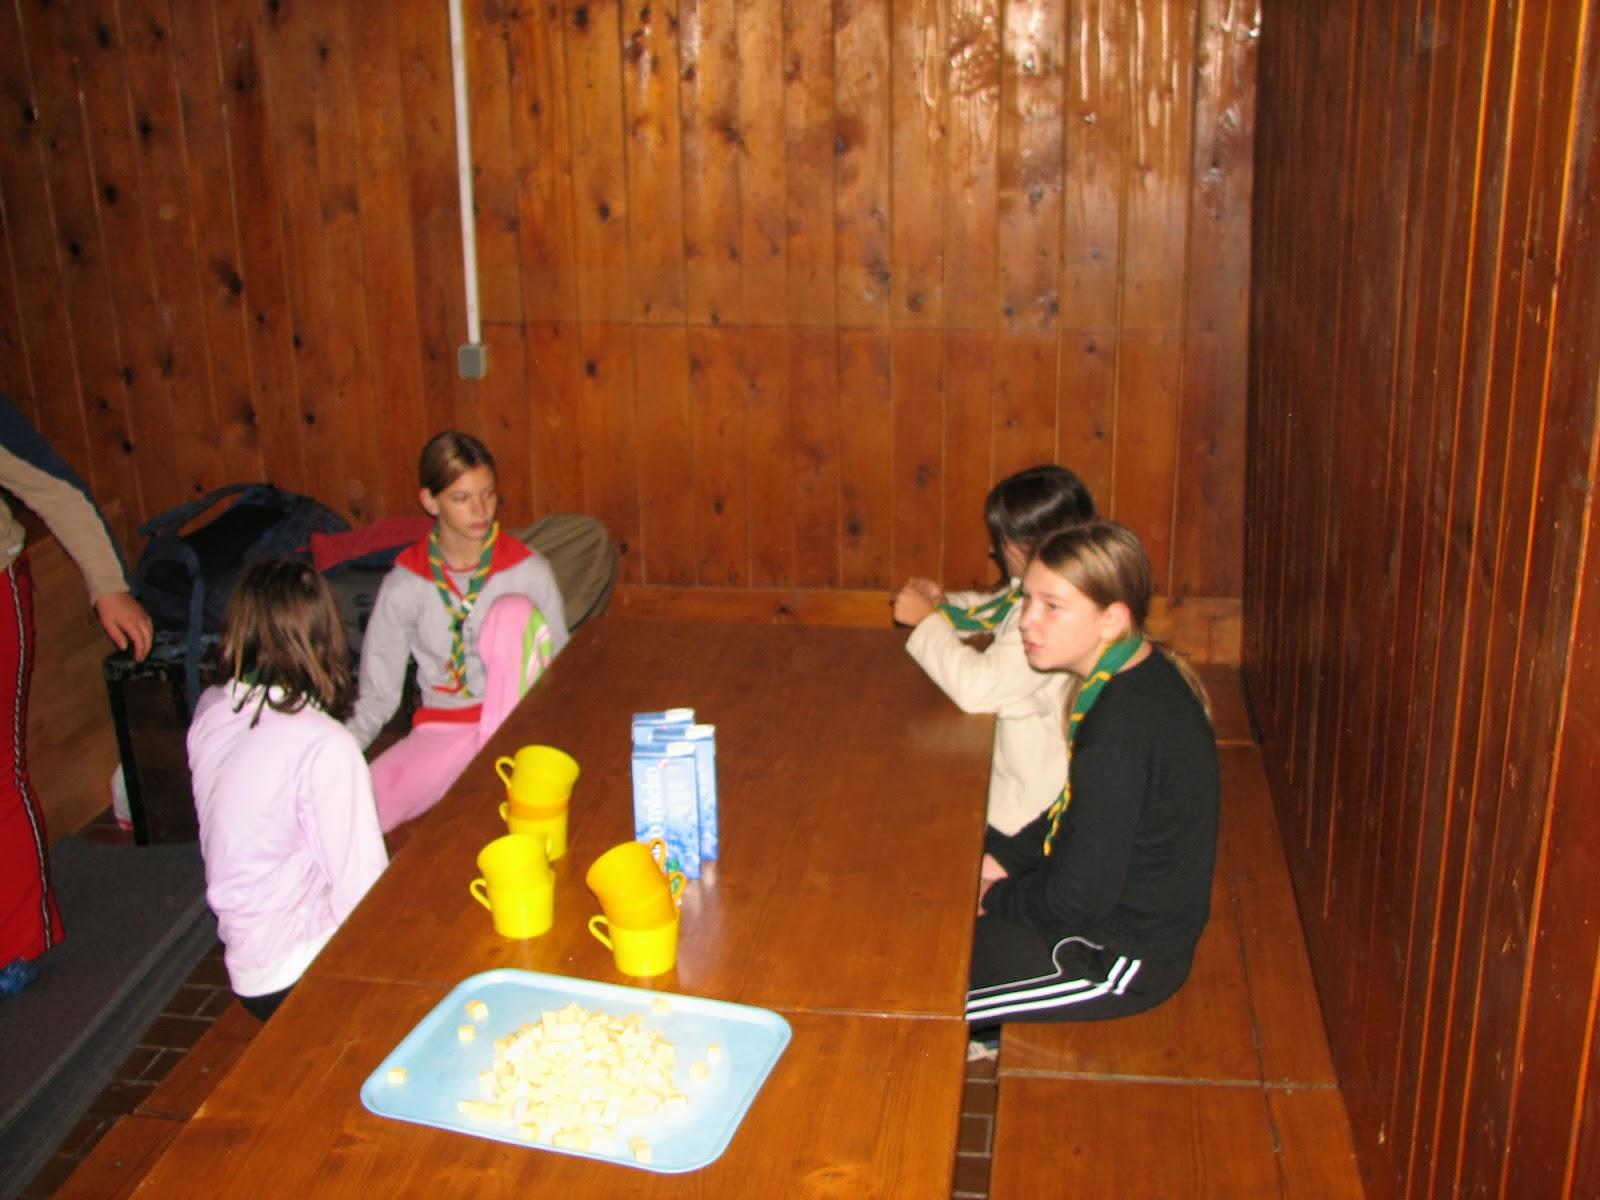 Vodov izlet, Ilirska Bistrica 2005 - Picture%2B289.jpg